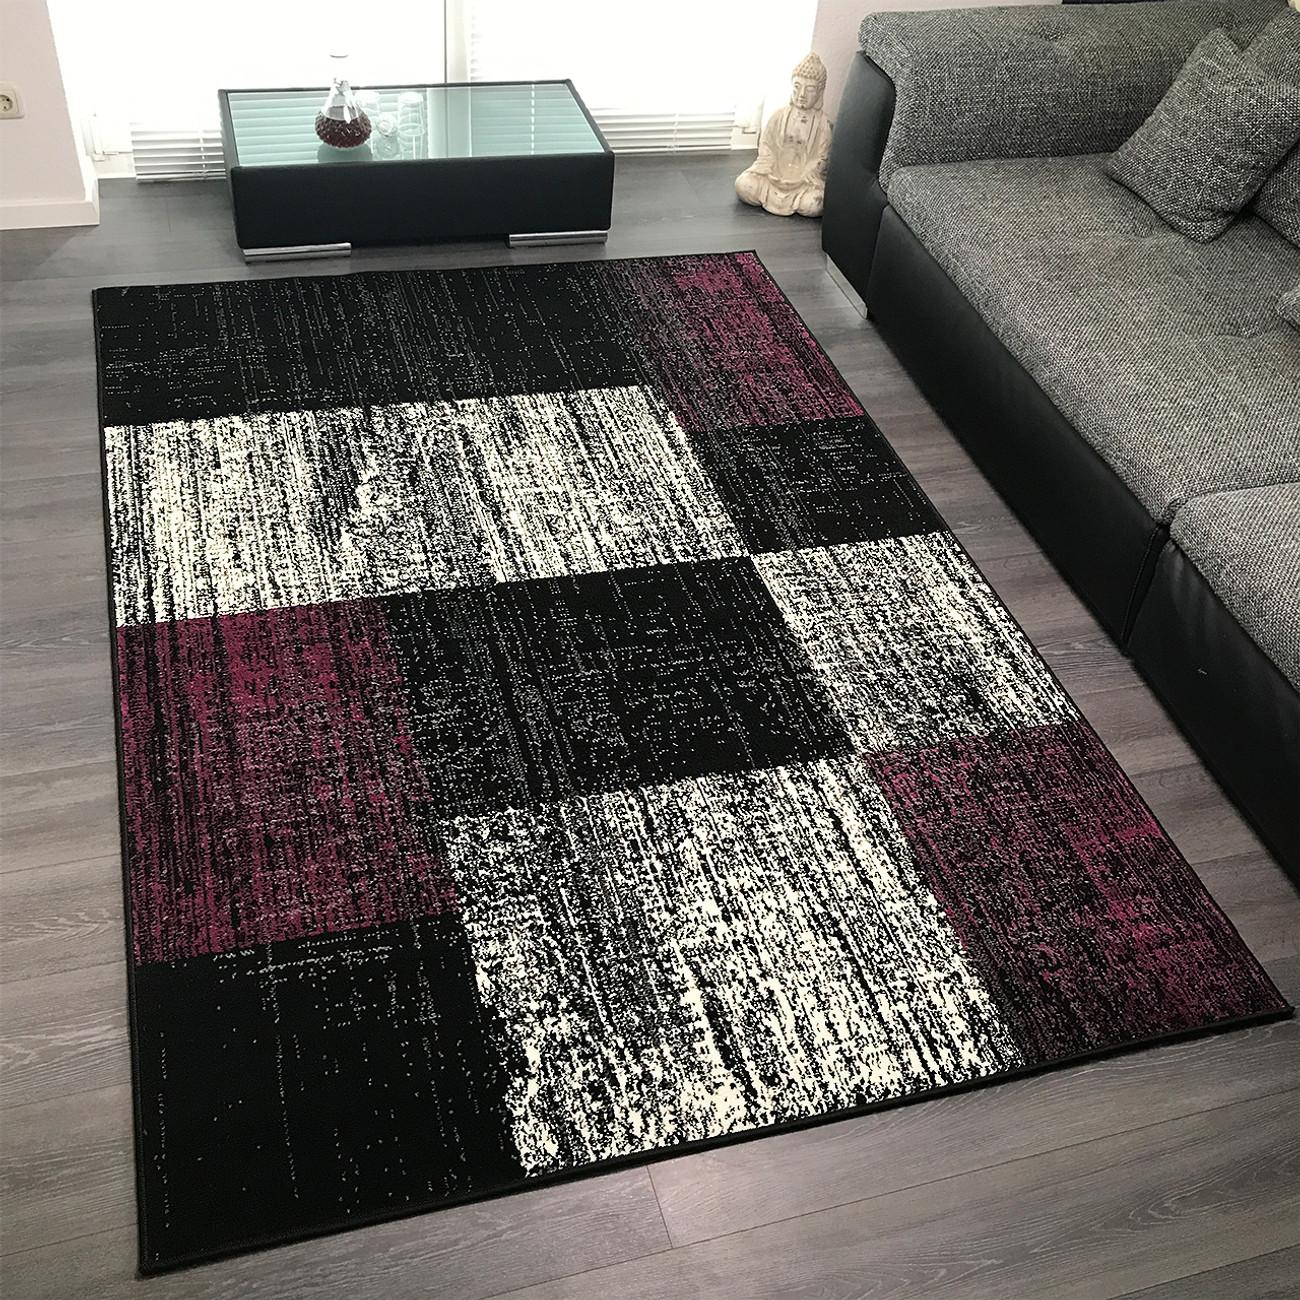 design velours kurzflor teppich 39 patch 39 vintage muster teppiche design teppiche. Black Bedroom Furniture Sets. Home Design Ideas